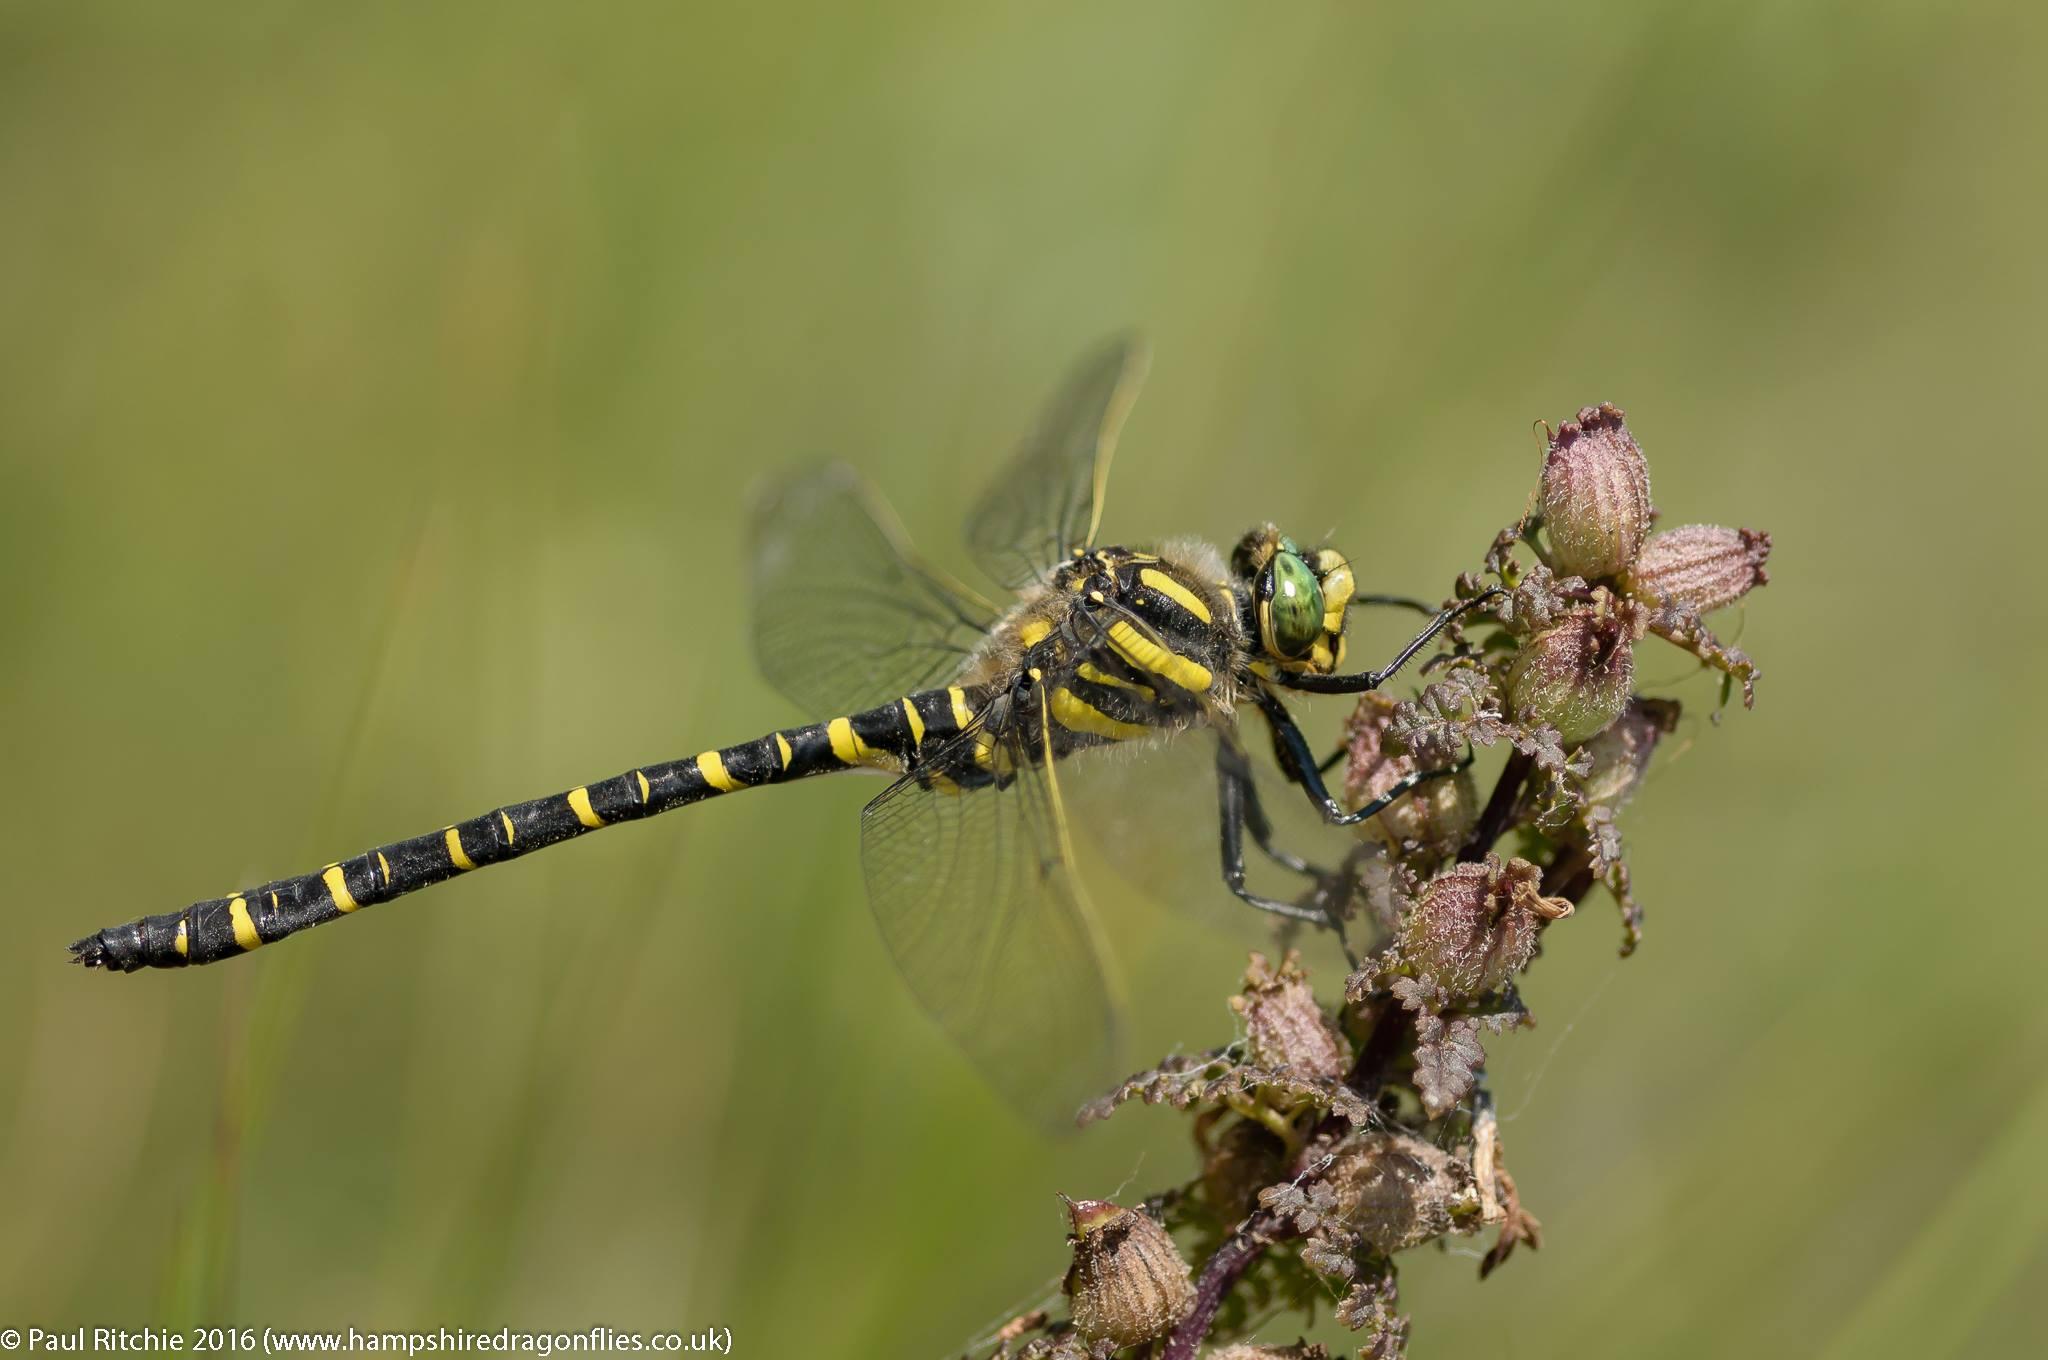 Golden Ringed Dragonfly (Cordulegaster boltonii) - male